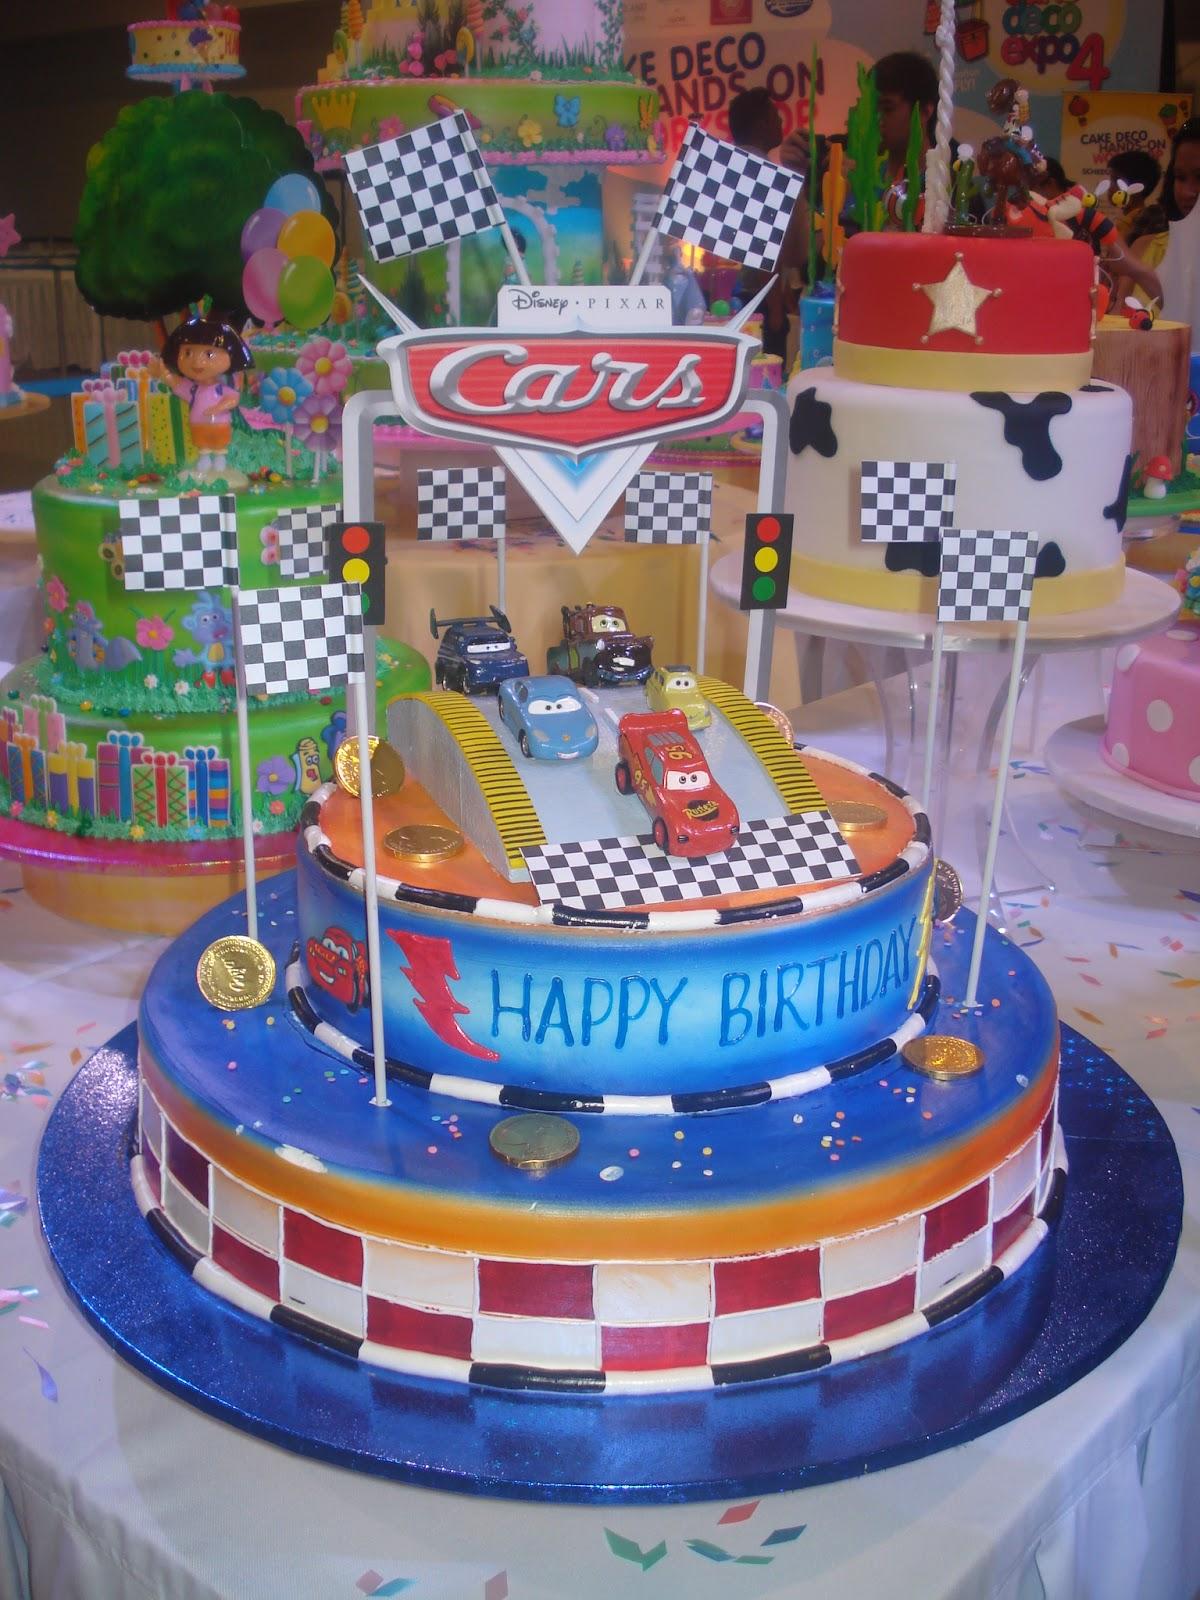 10 Goldilocks Cakes Price List 2013 Photo Goldilocks Birthday